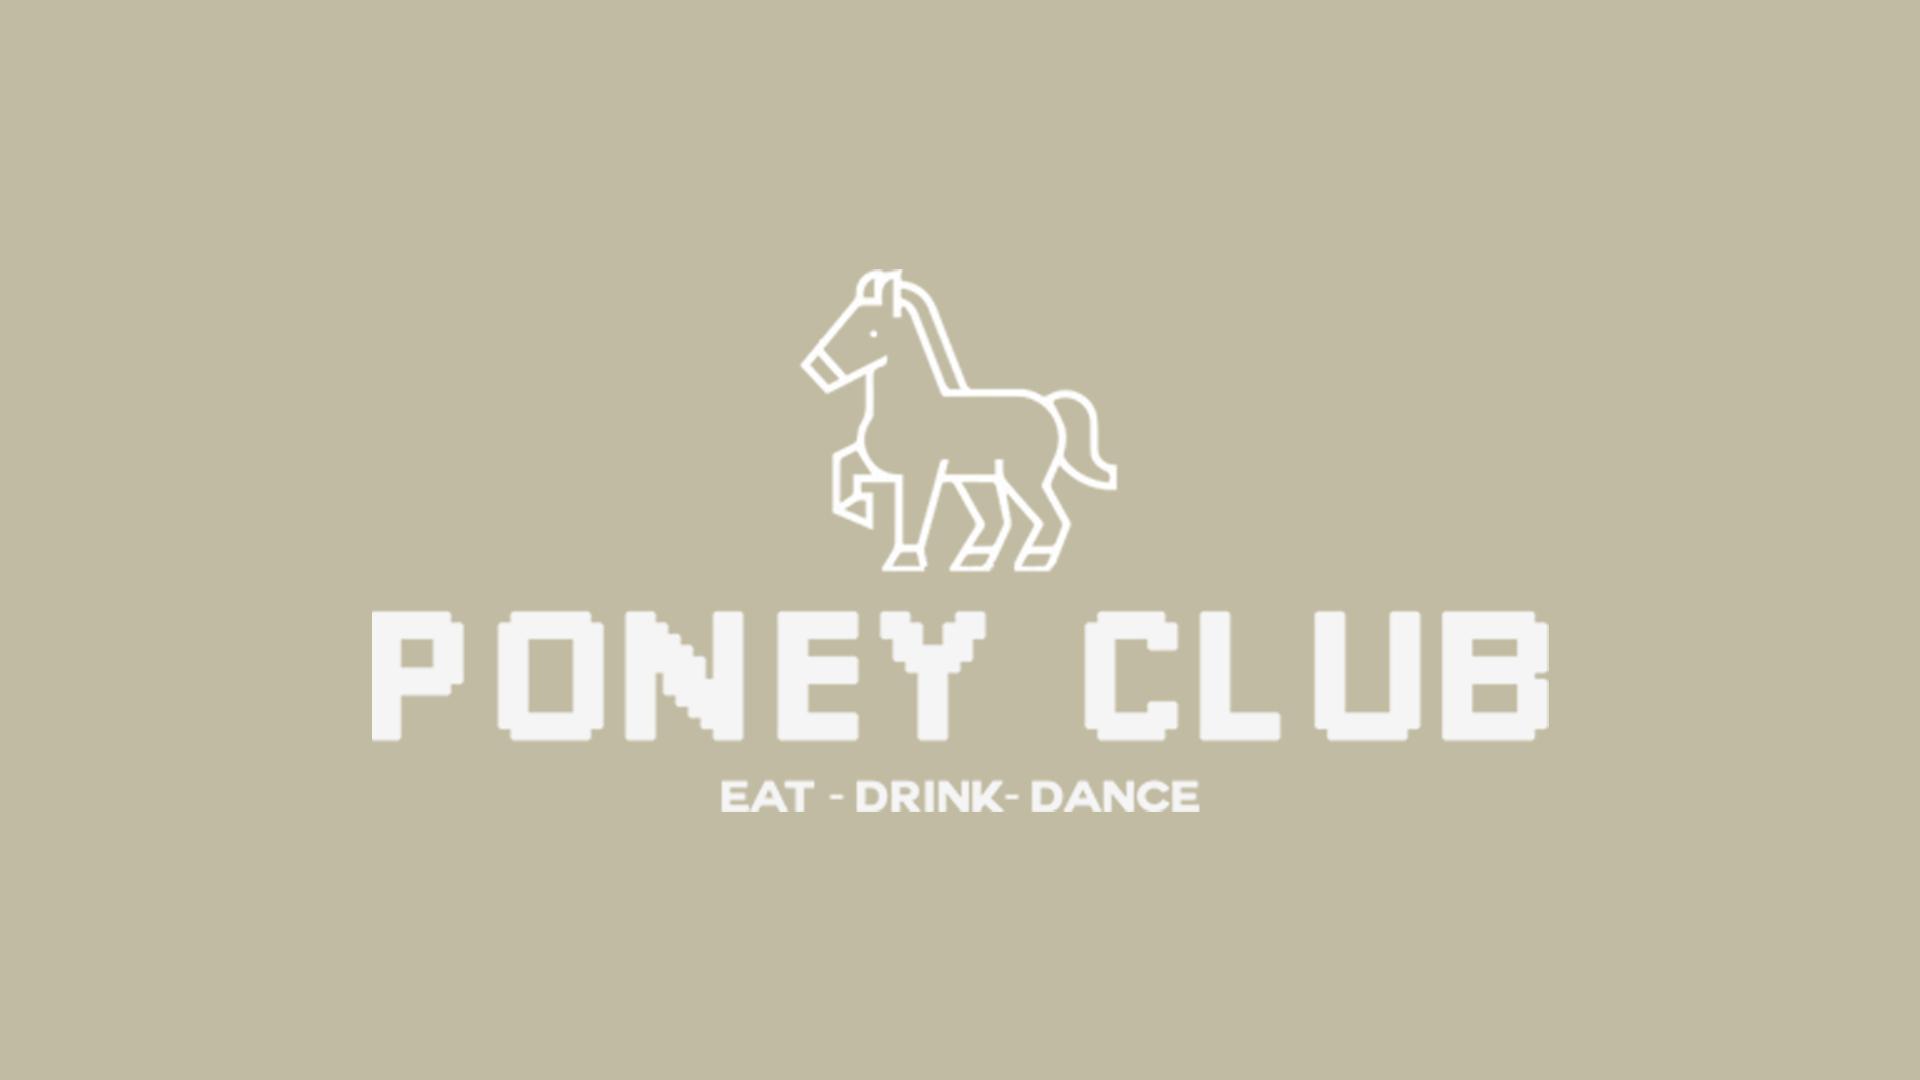 J'peux pas j'ai poney - Opening